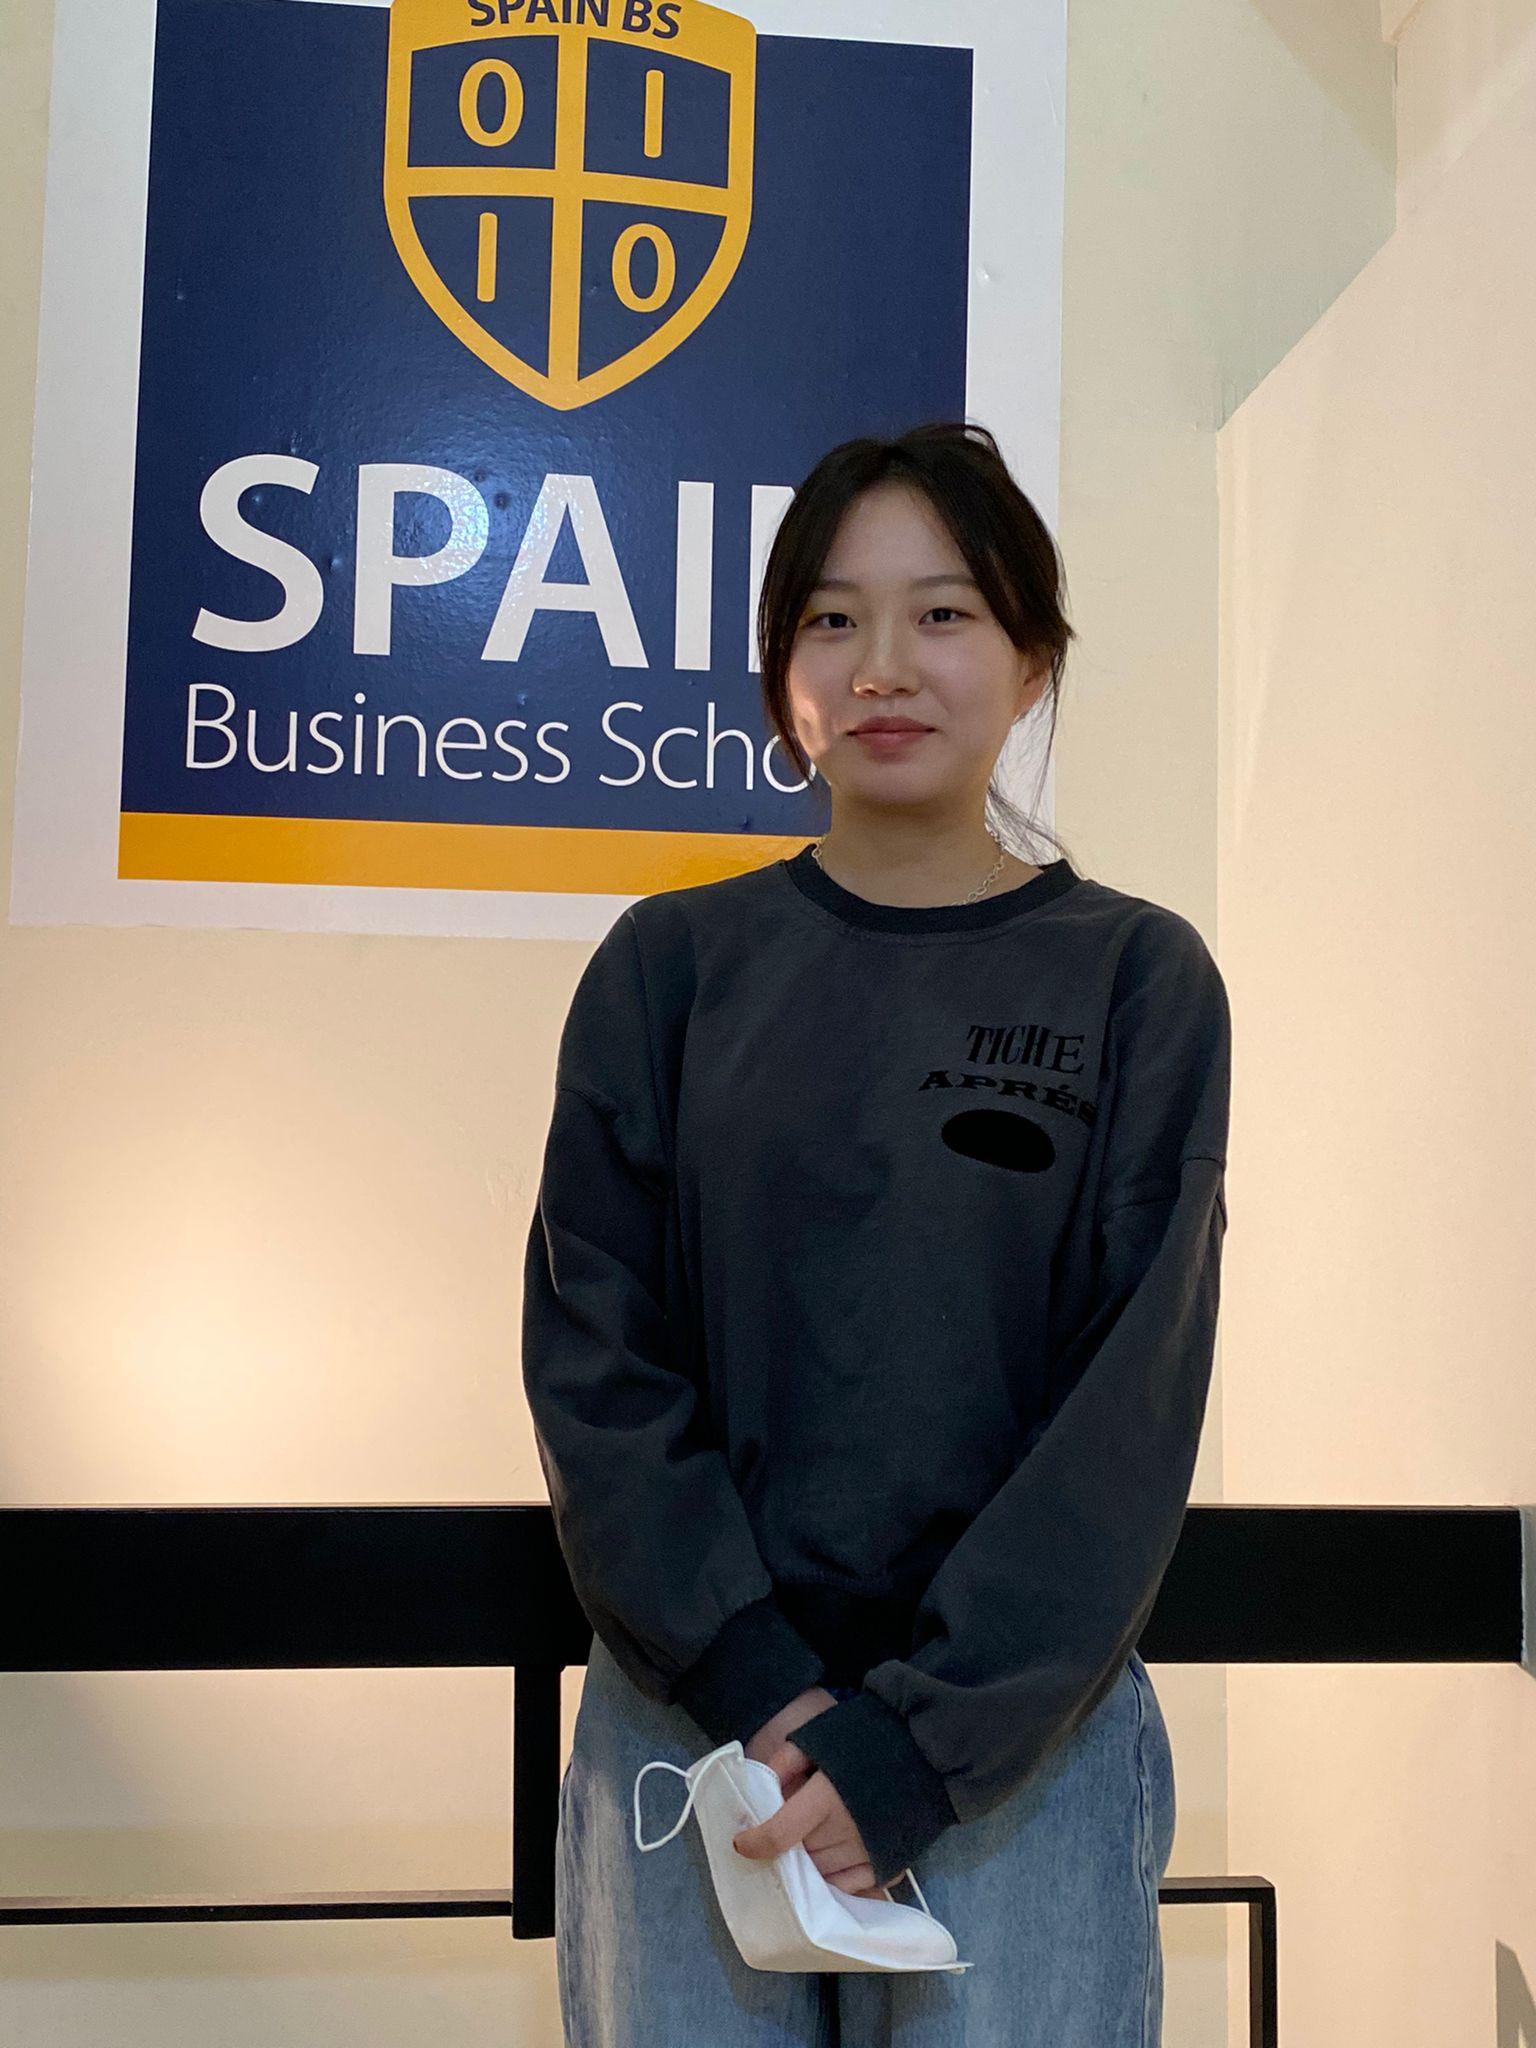 Enji Song escoge SpainBS para especializarse en análisis de datos